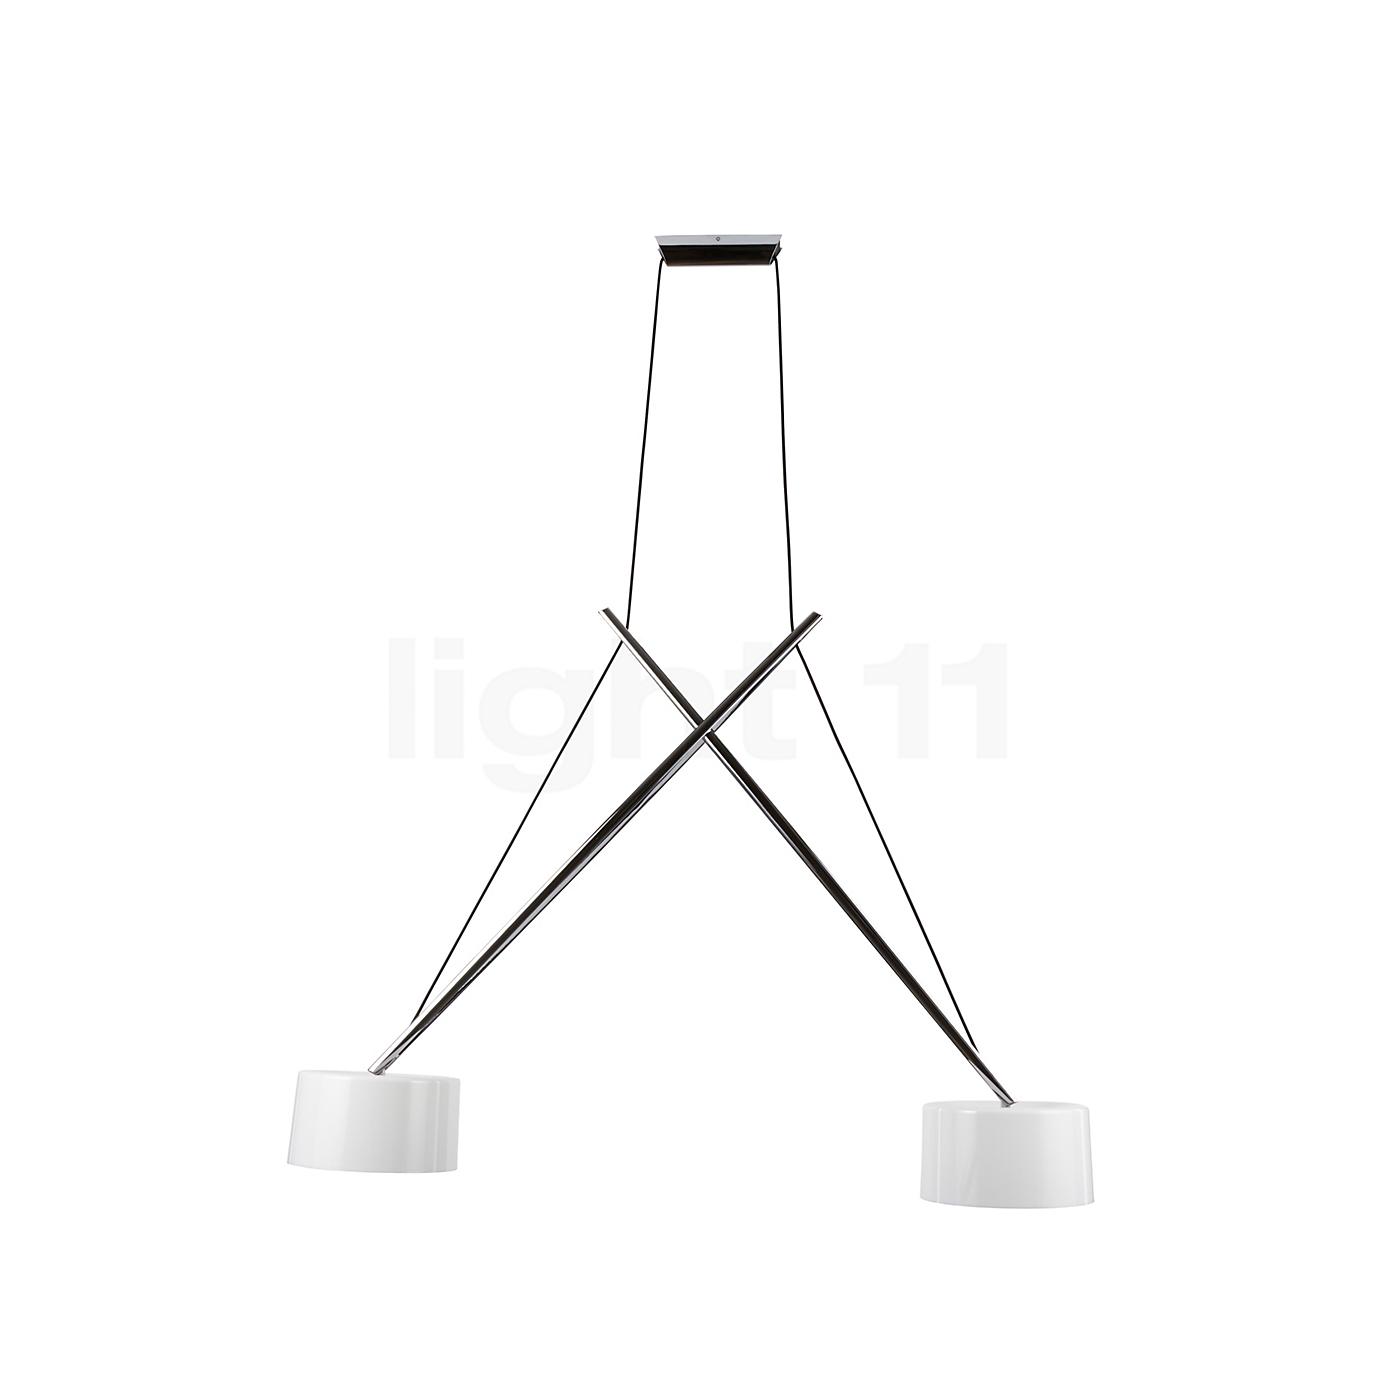 serien lighting twin pendel bordlamper k be p. Black Bedroom Furniture Sets. Home Design Ideas